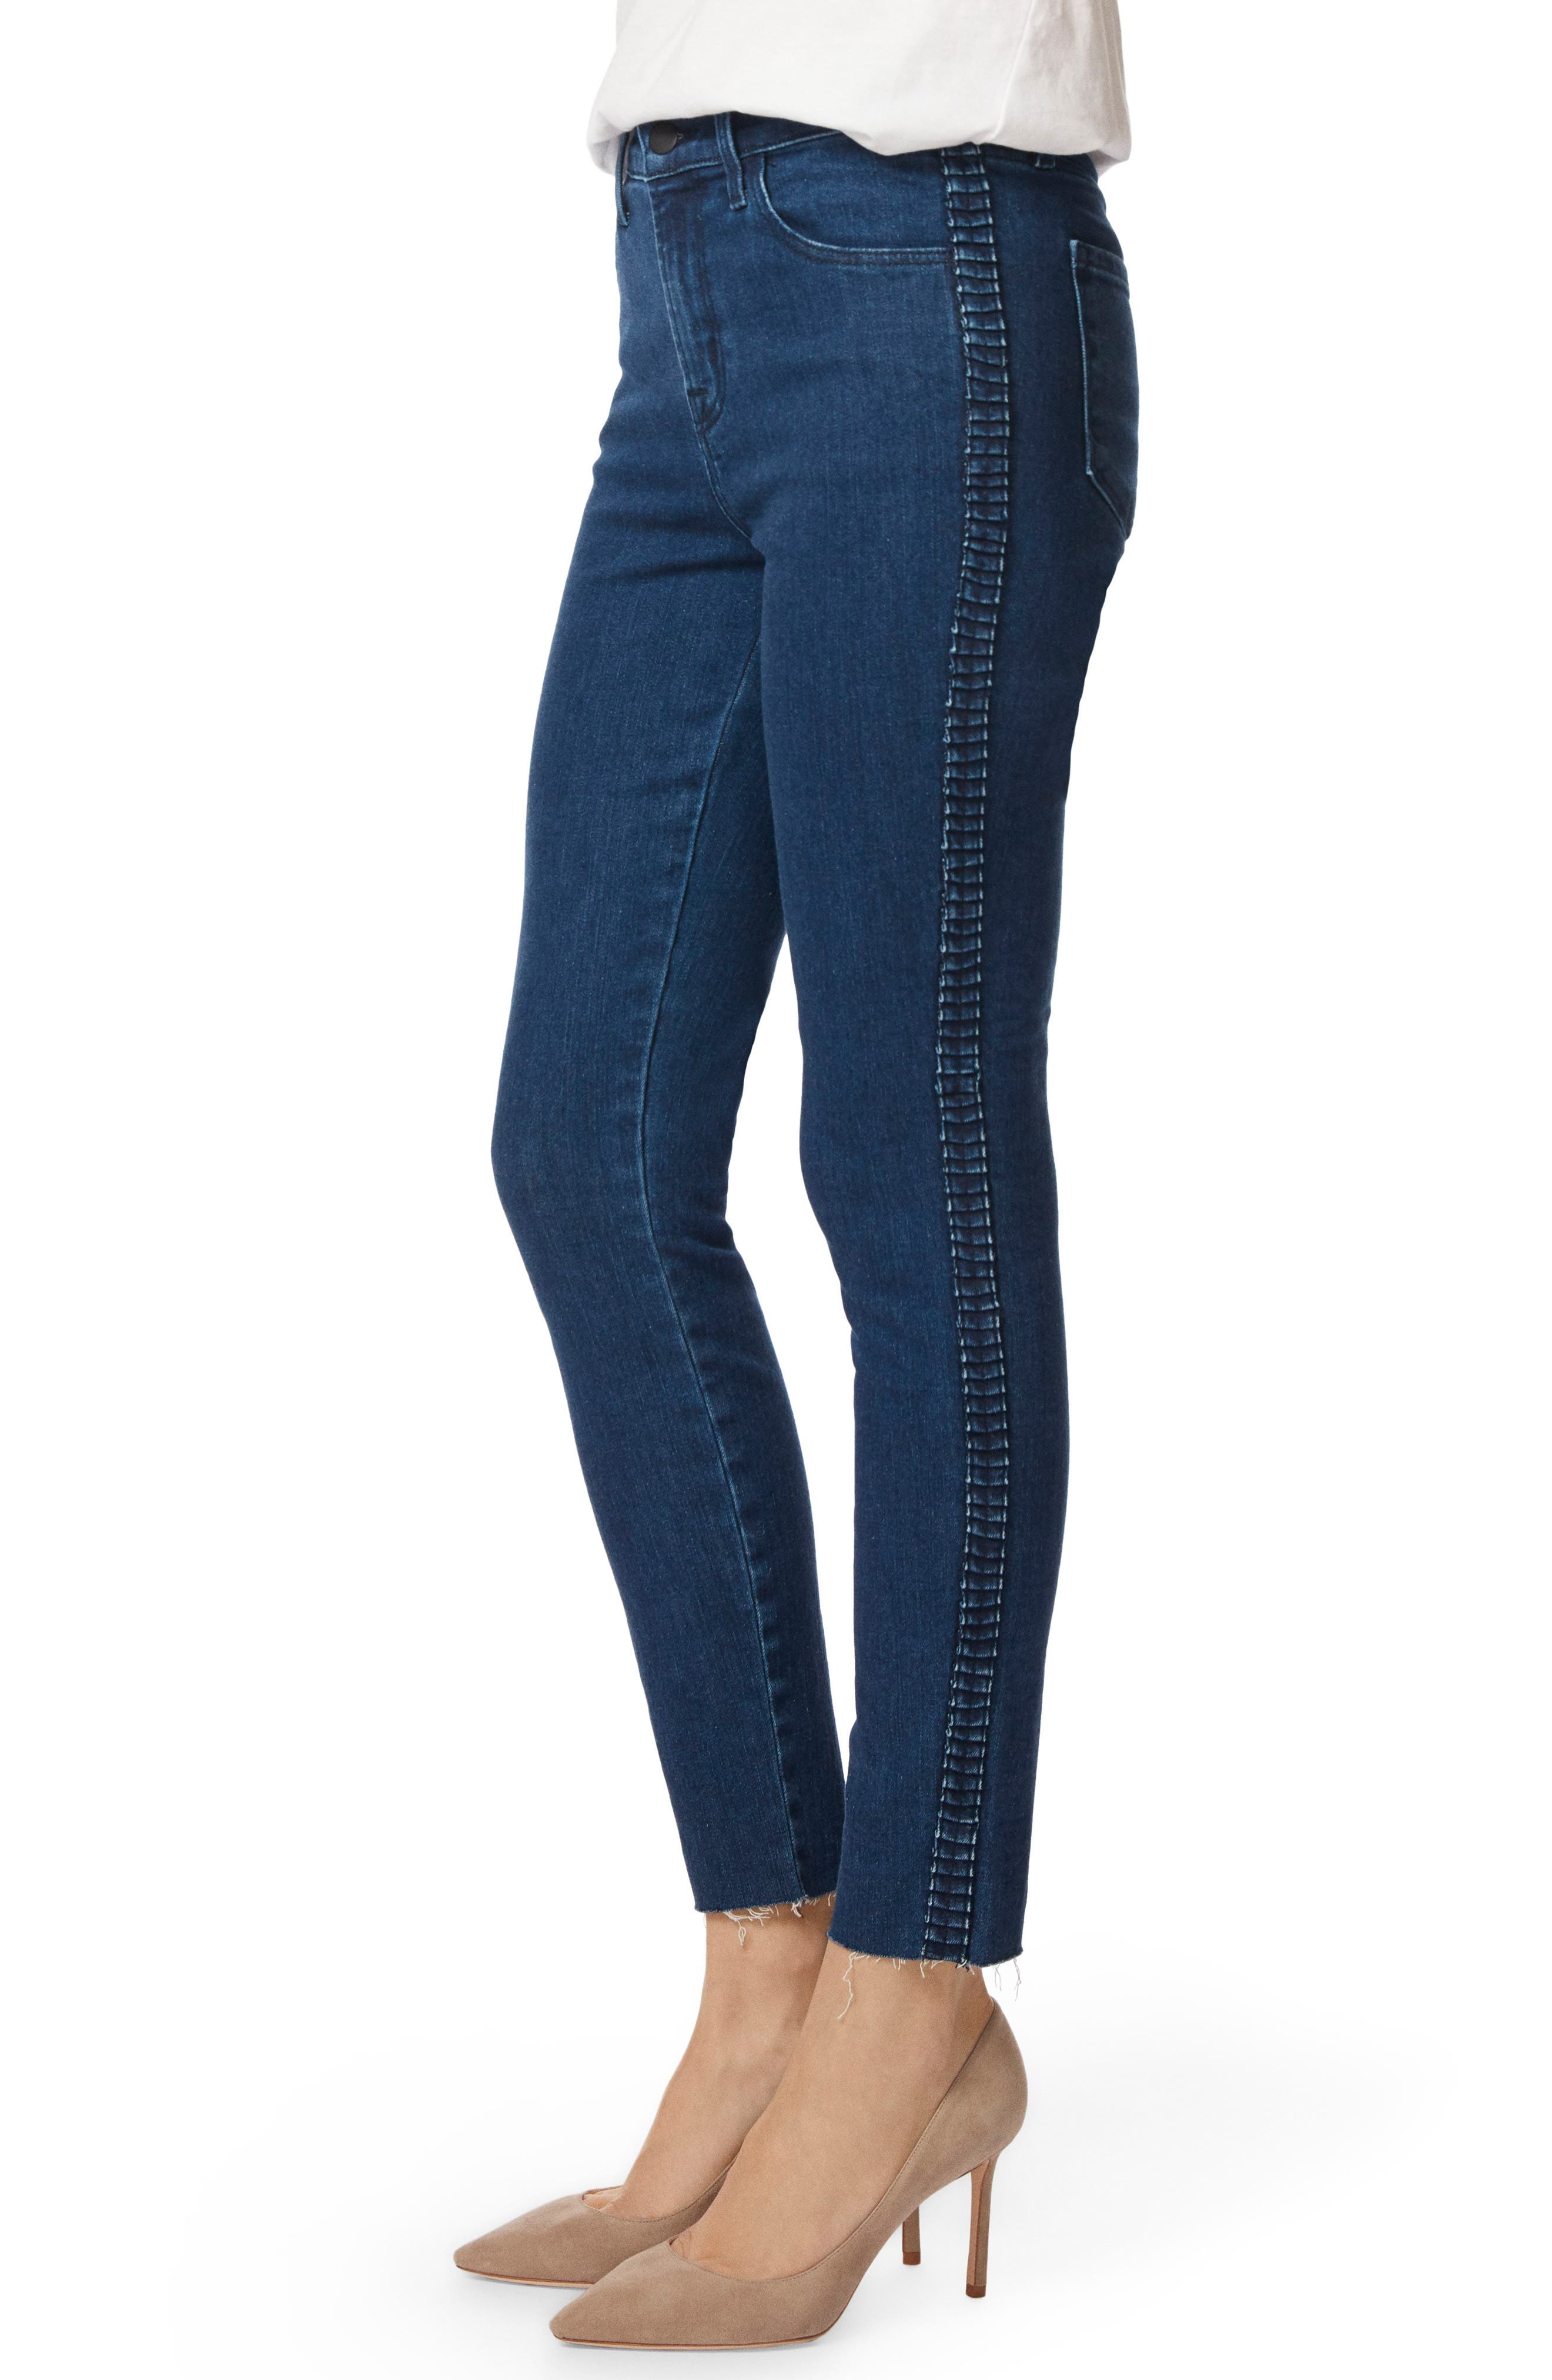 J BRAND,                             Alana High Waist Ankle Skinny Jeans,                             Alternate thumbnail 3, color,                             405